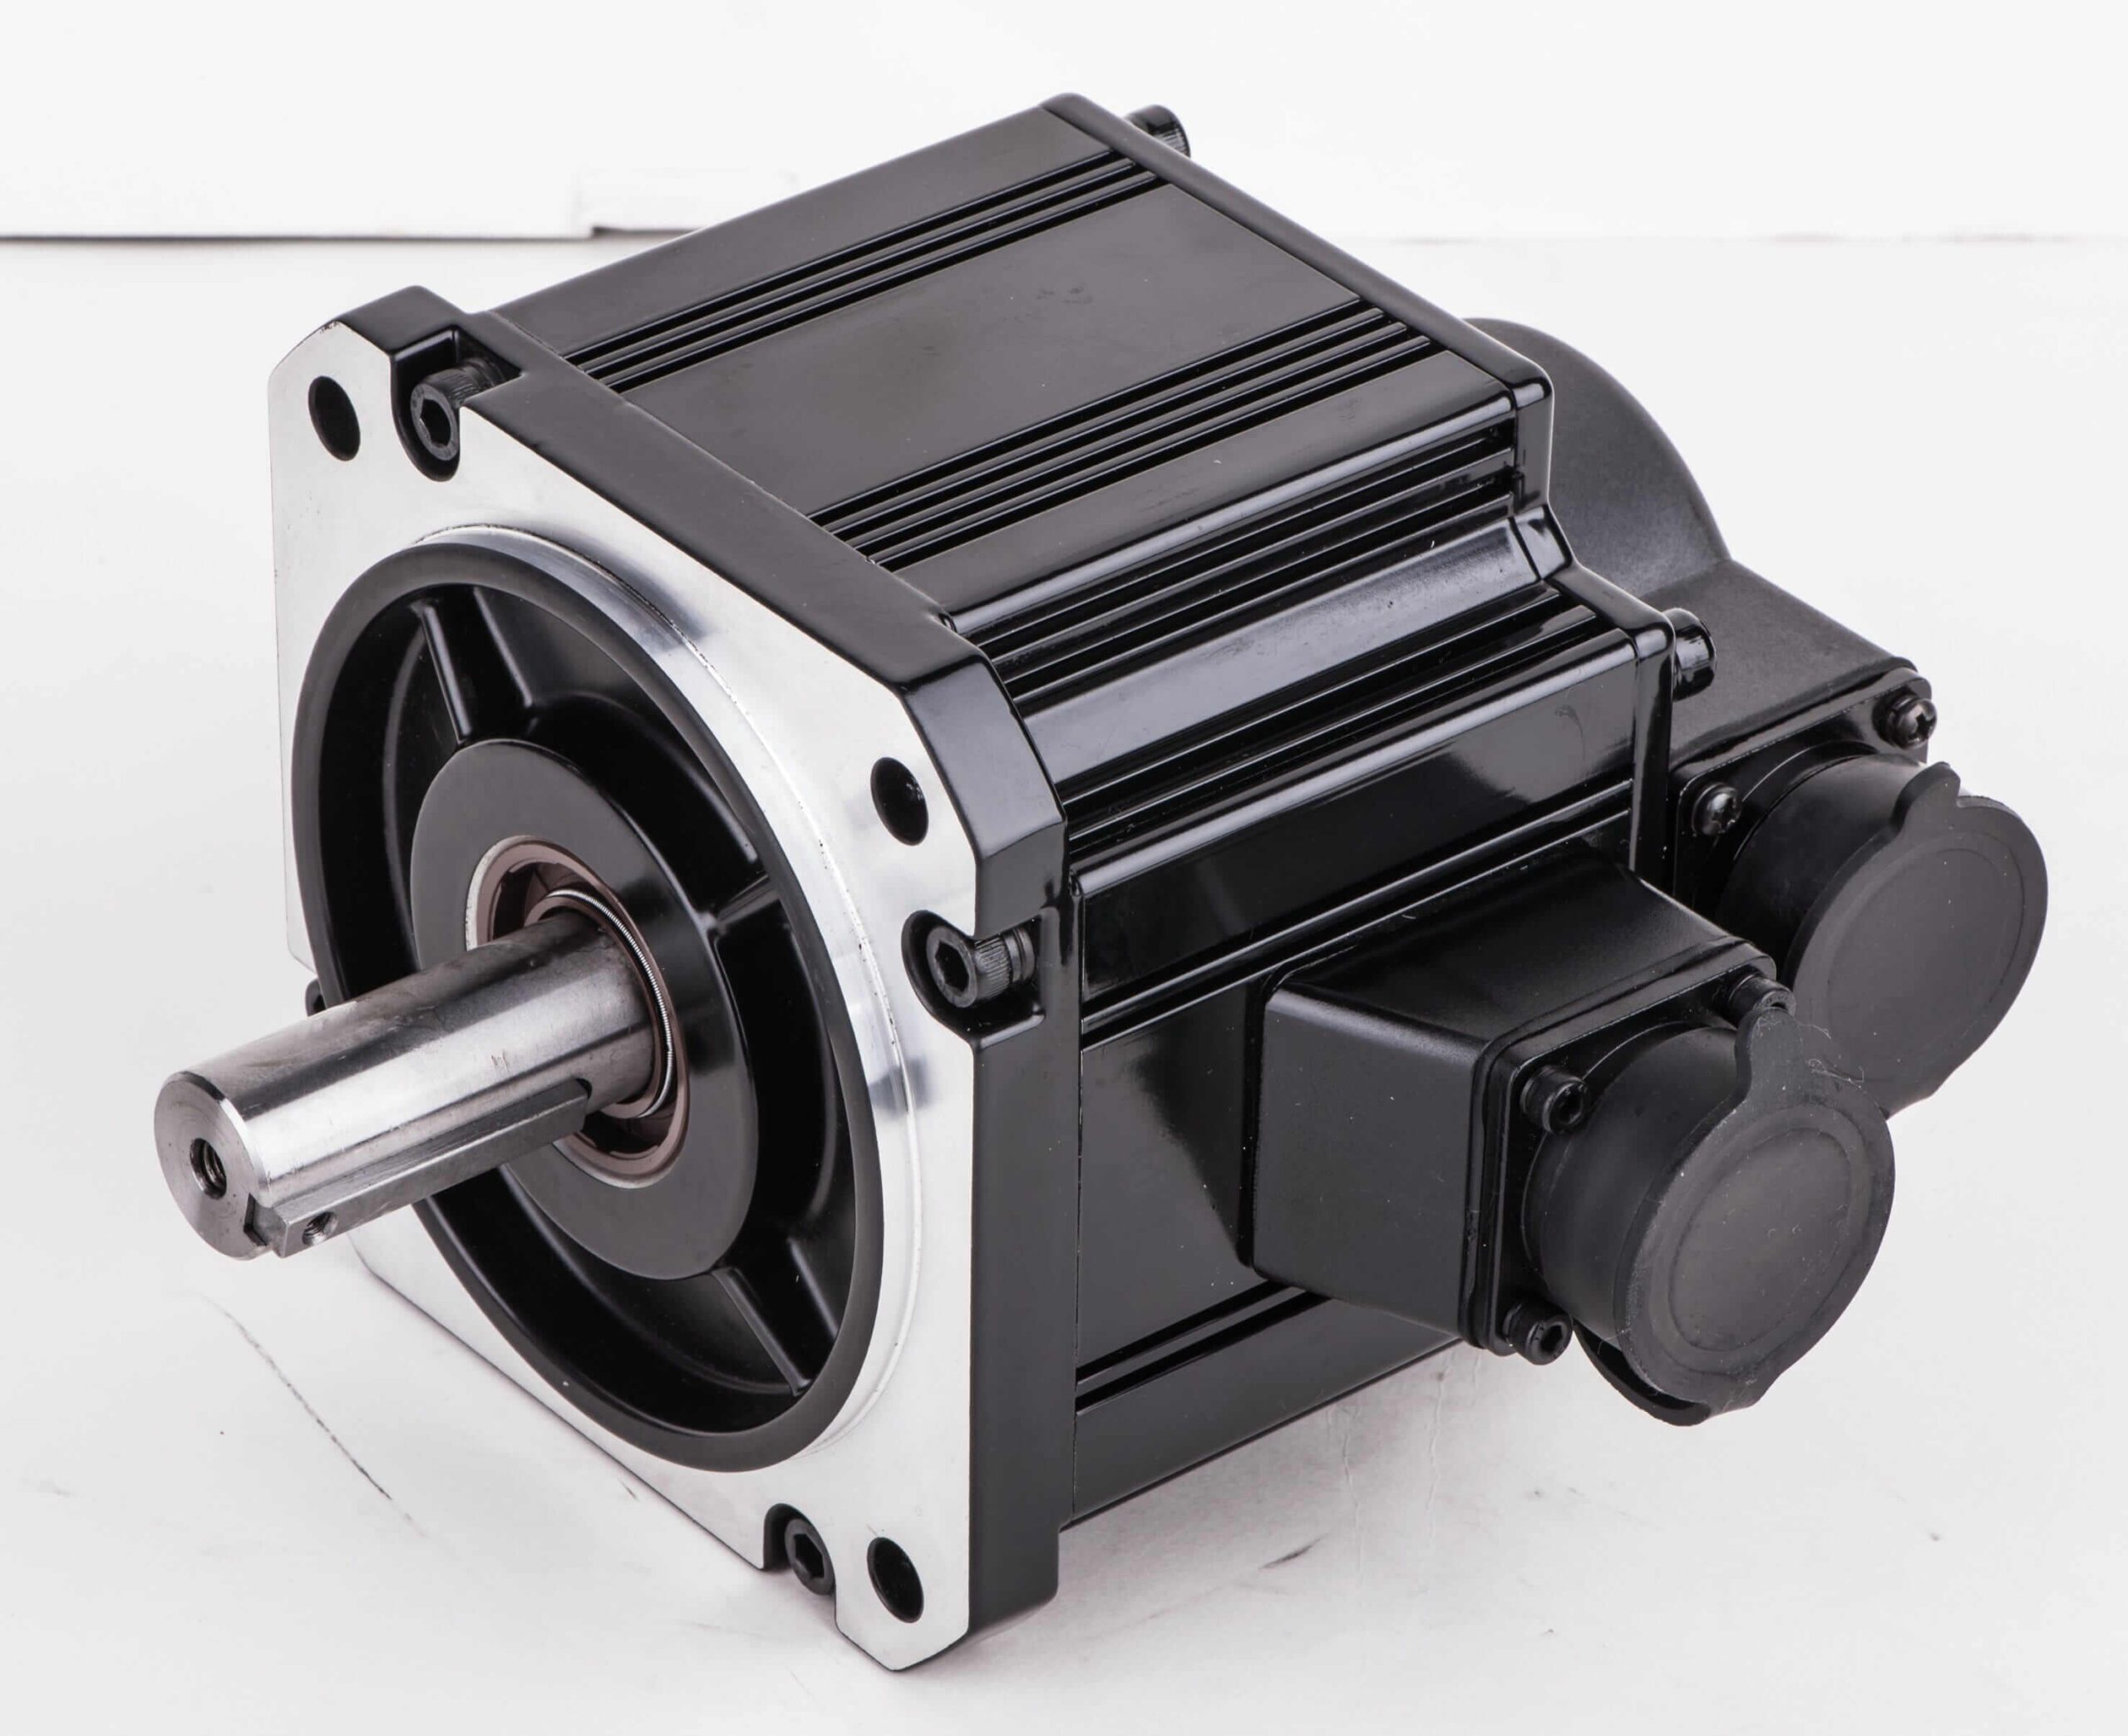 Imagem: 2021/03/Servo-motor-1-2kW-INVT-scaled.jpg